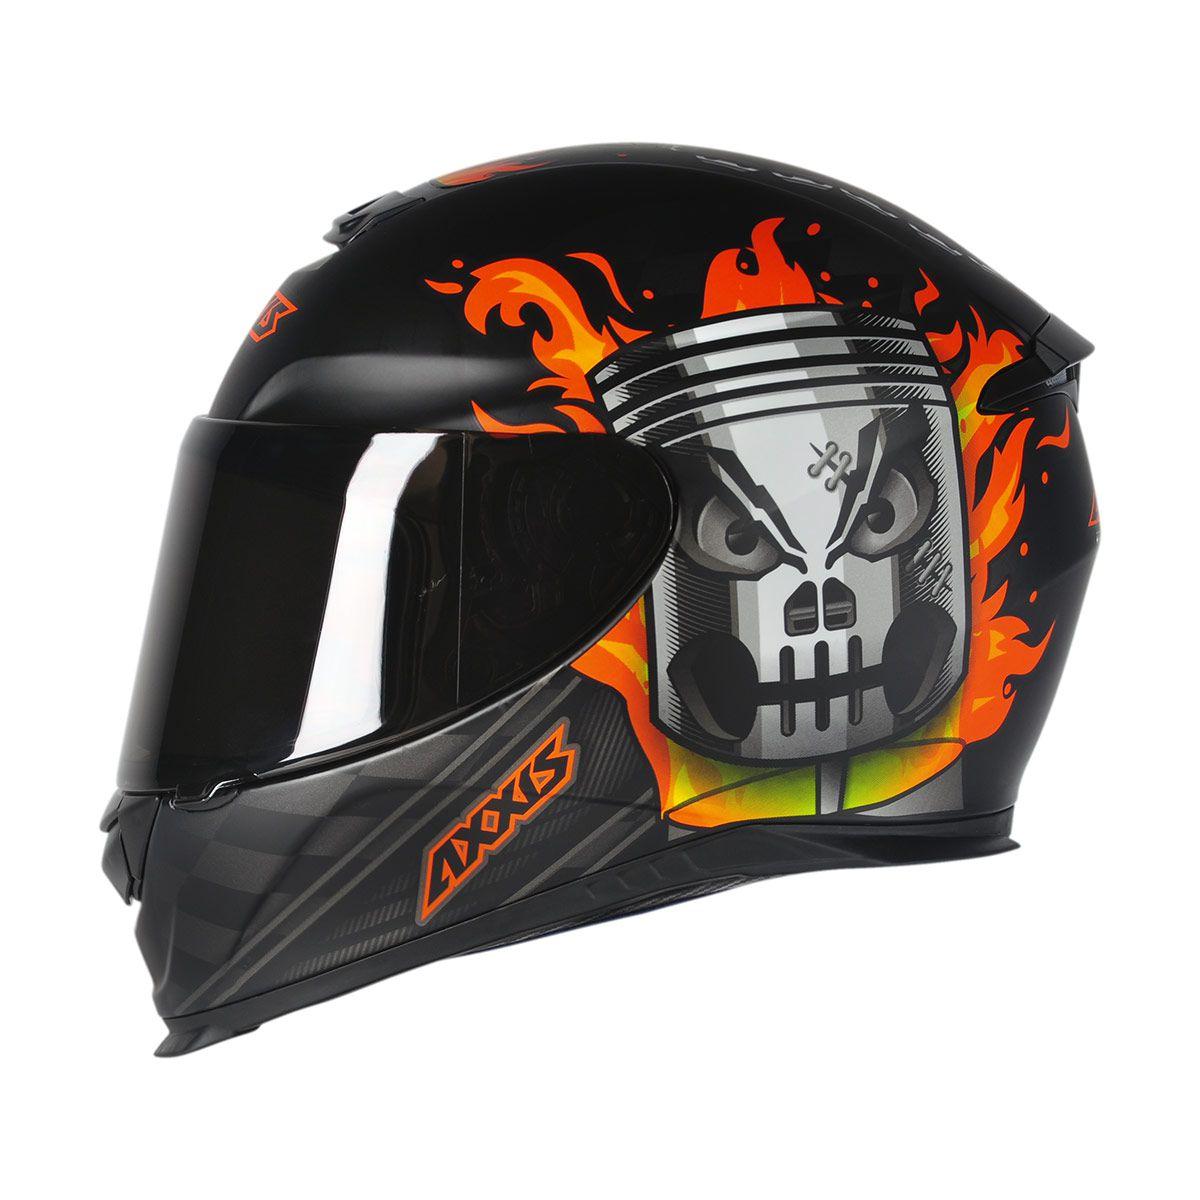 Capacete Axxis Eagle Piston Matt Black/Orange